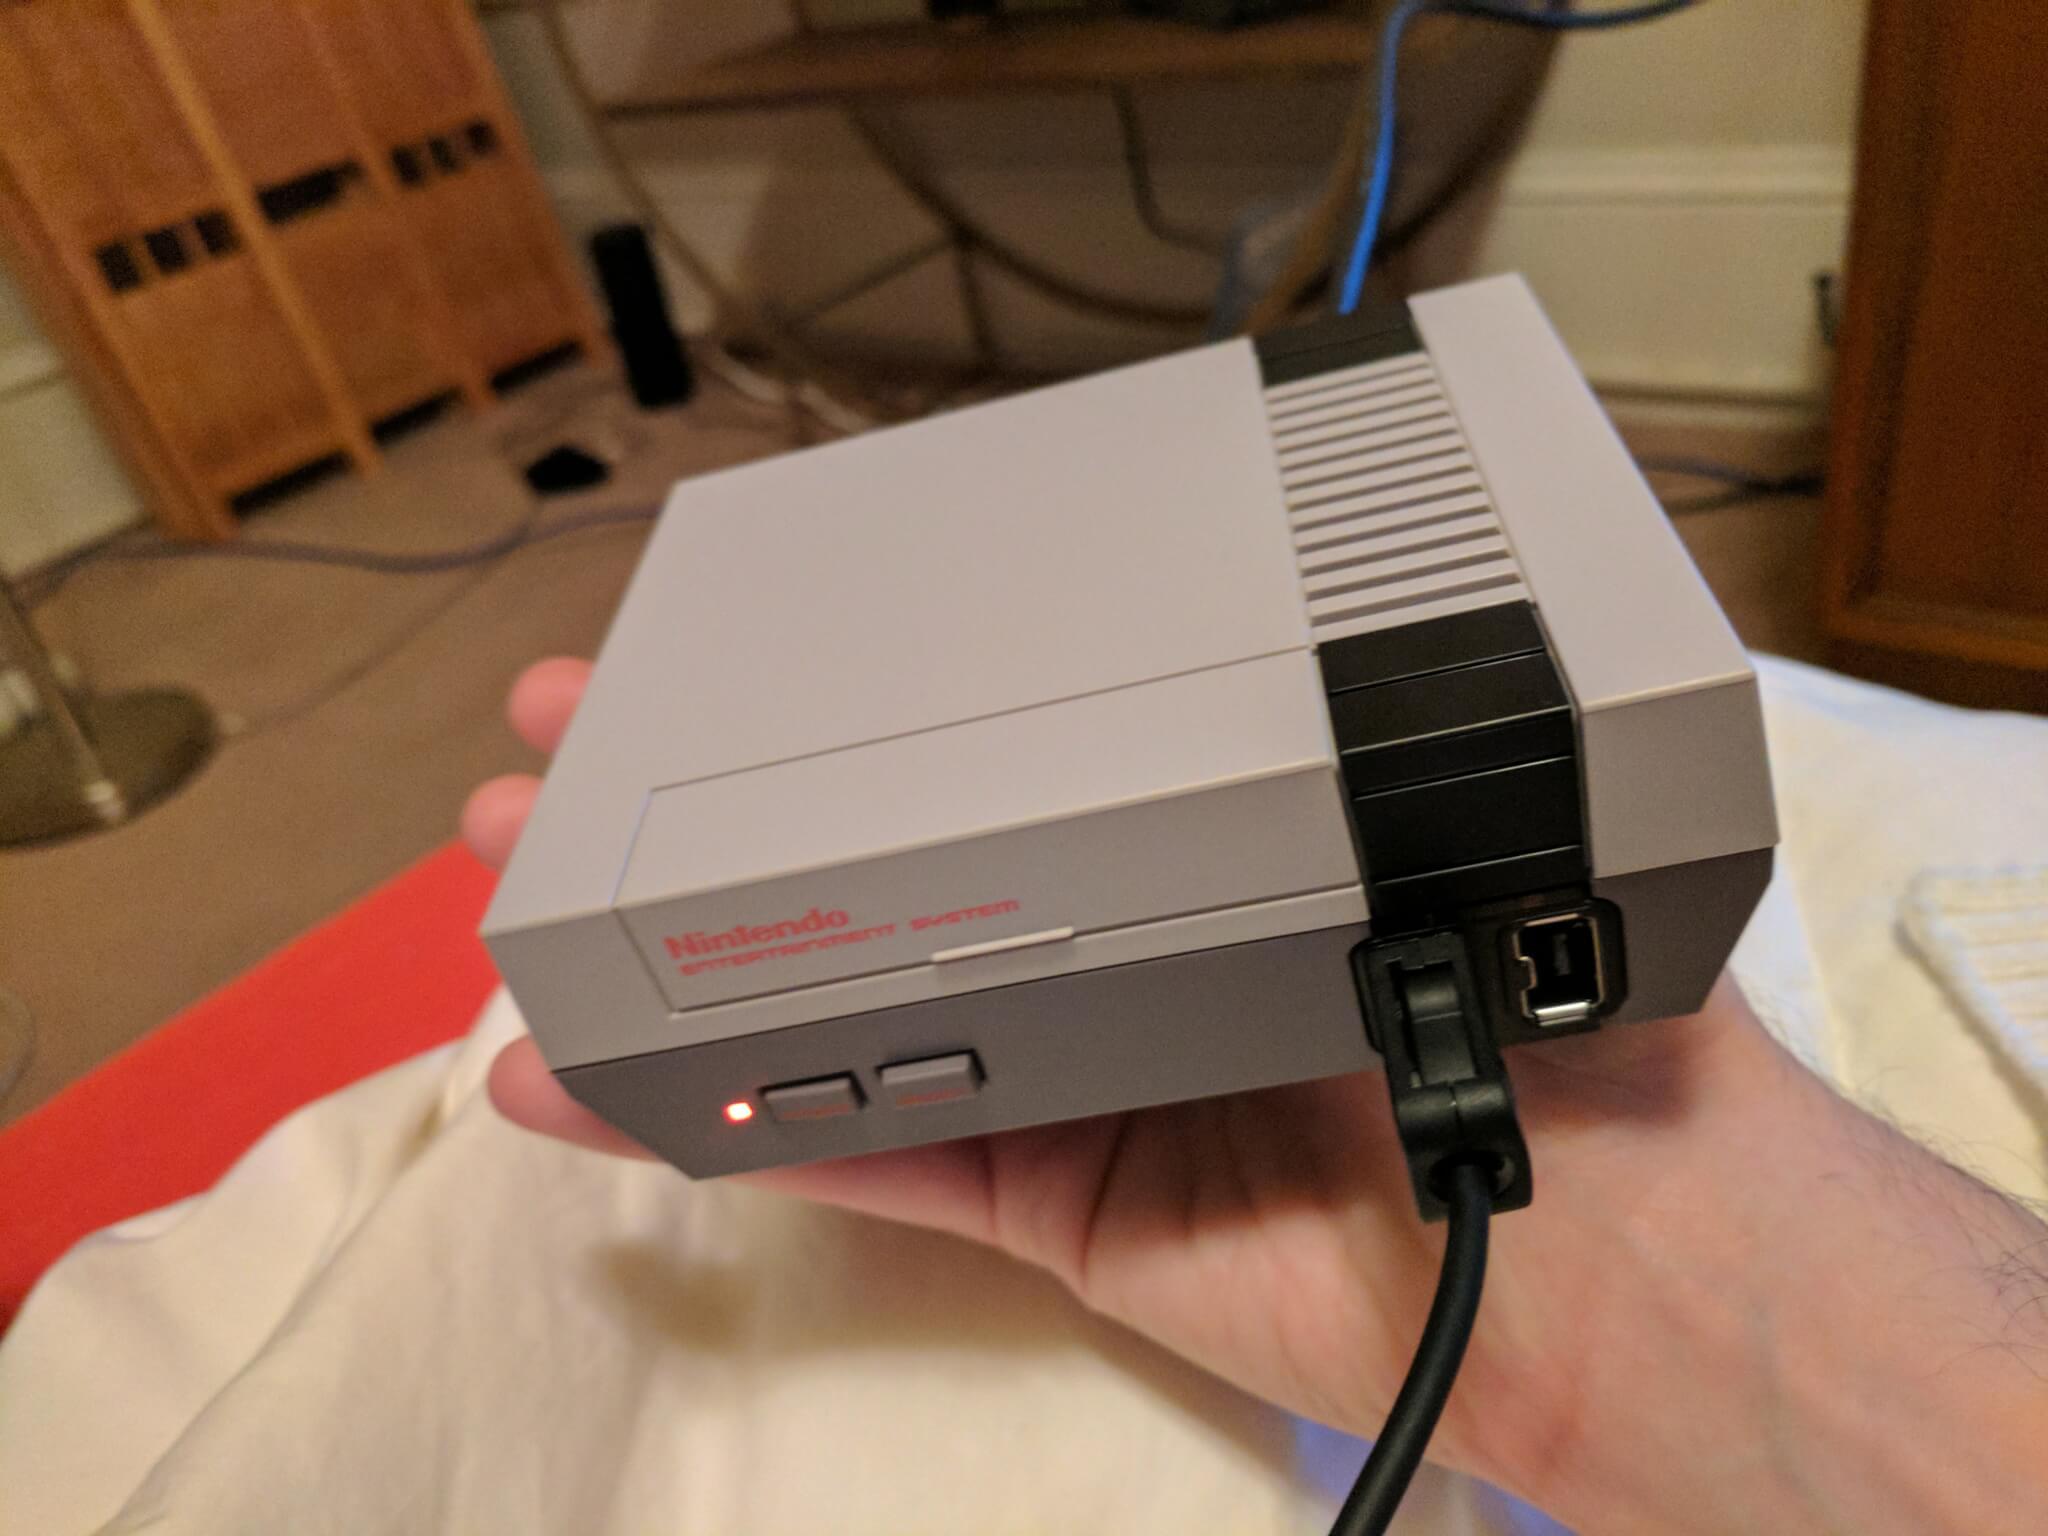 Nintendo's NES Classic.